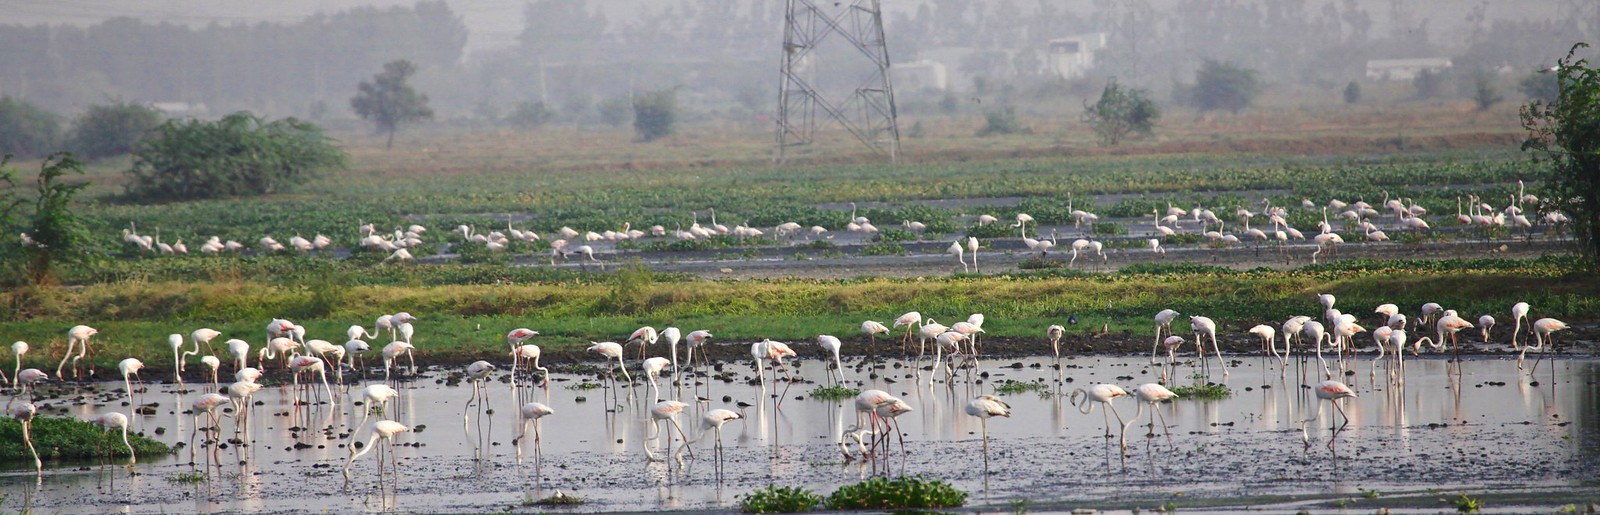 Najafgarh Wetland Birding